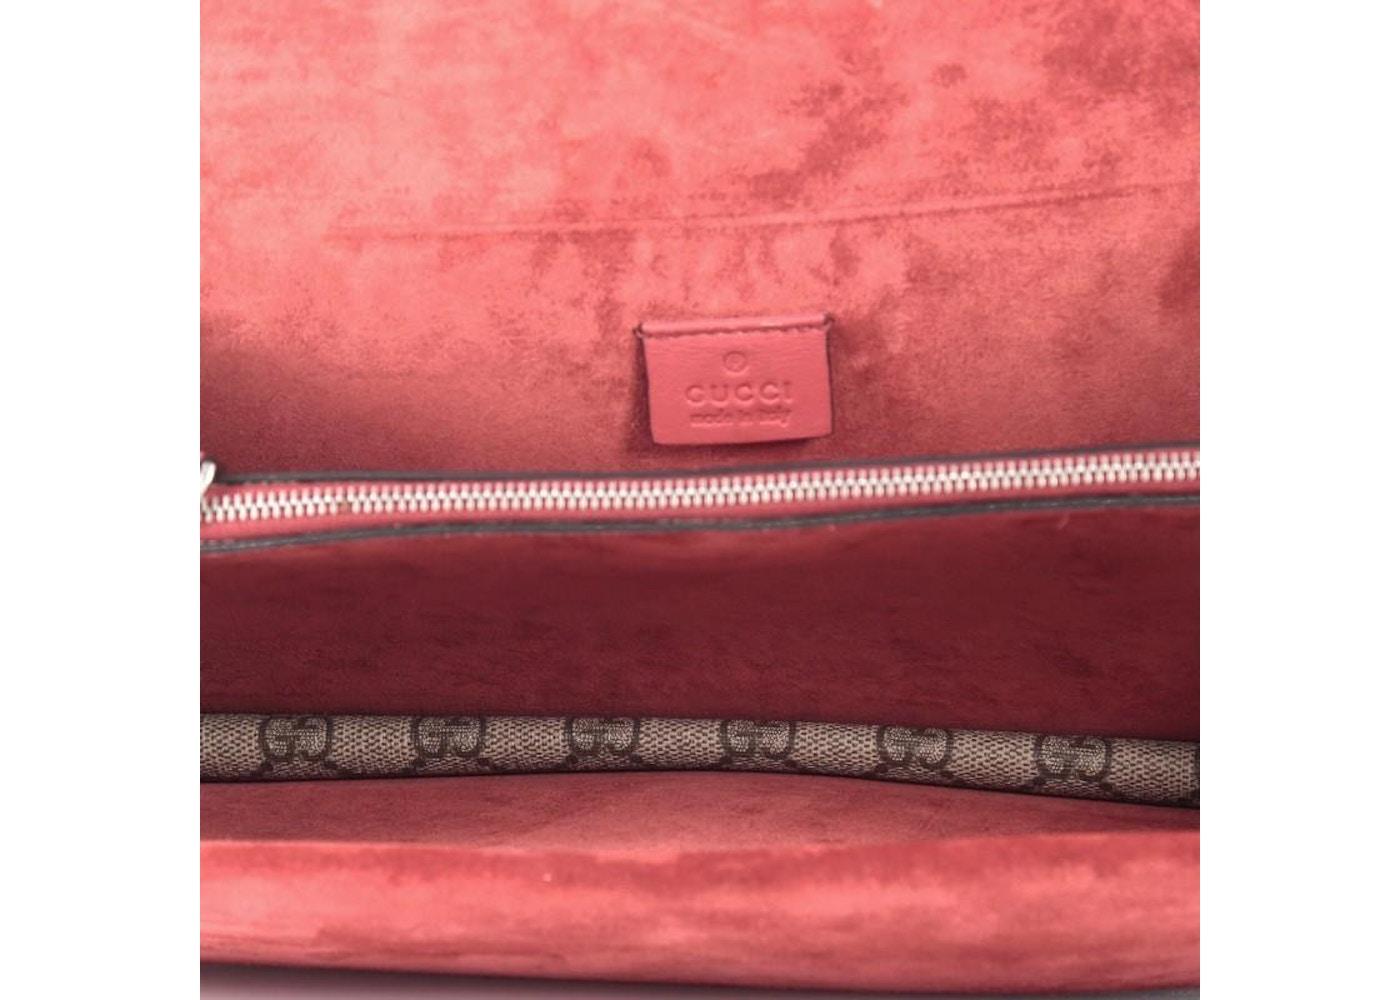 08bb6764591 Gucci Dionysus Handbag Monogram GG Small Taupe/Red